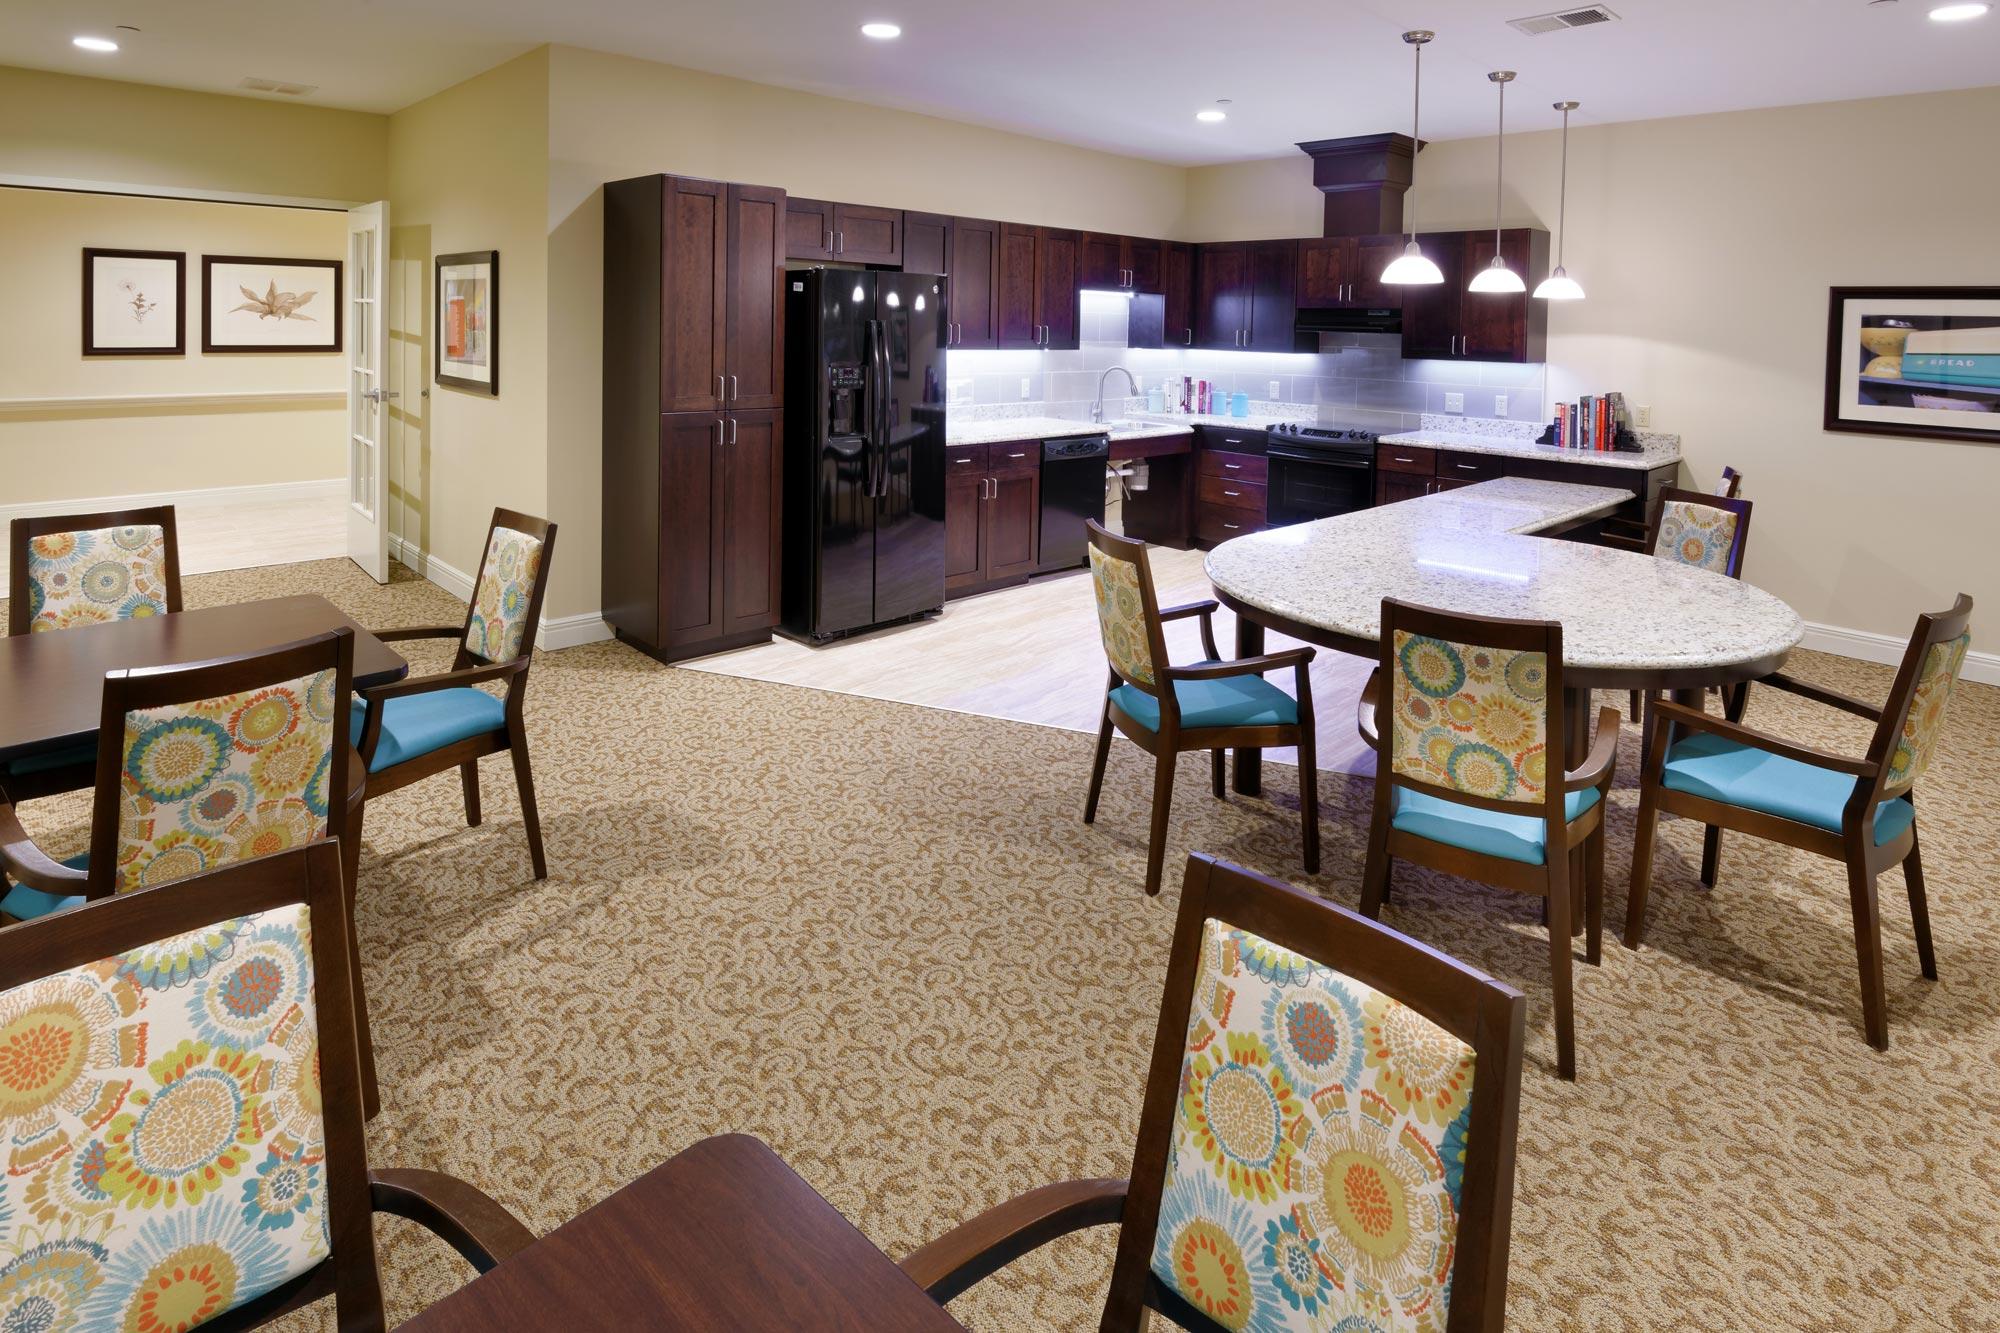 Castlewood-Senior-Living-H-Design-Interior-04.jpg